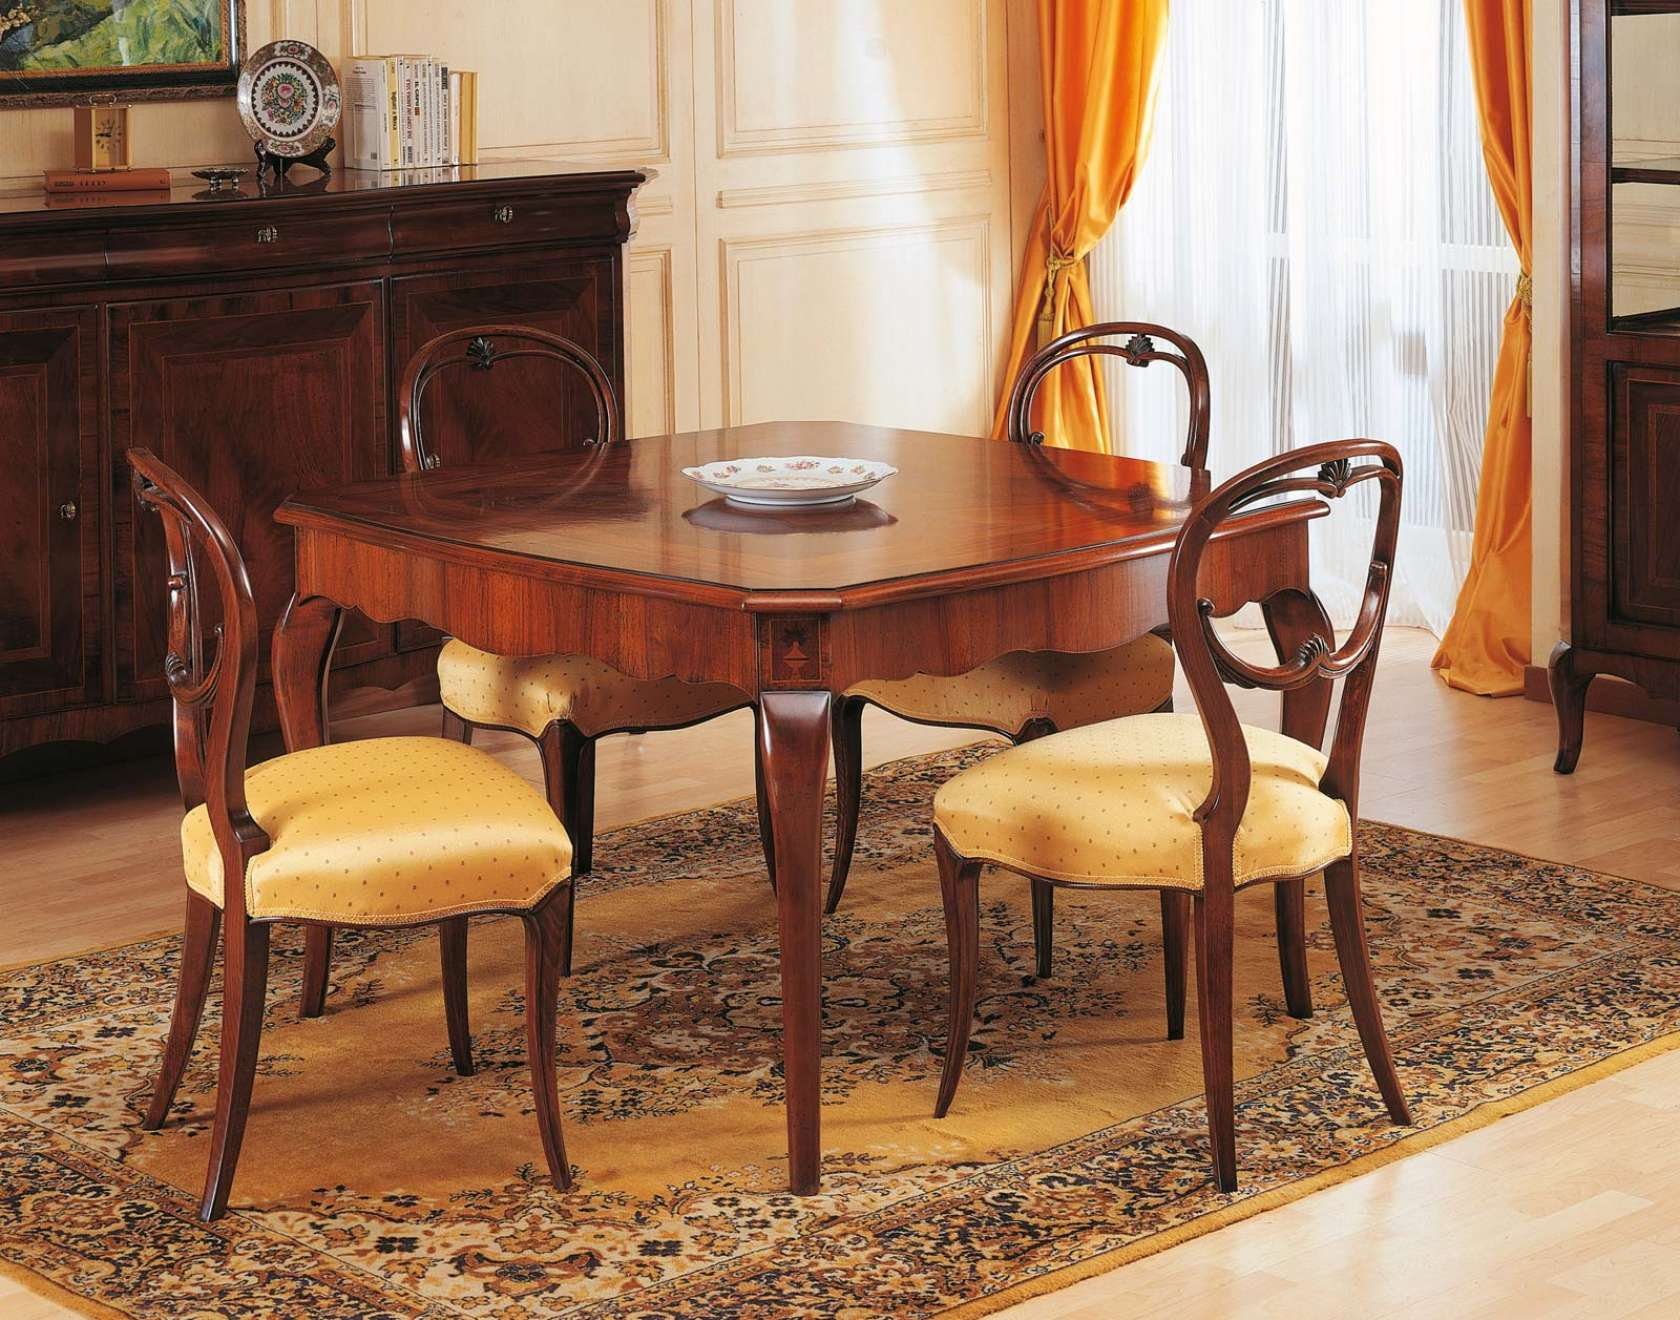 Sedie Ottocento Francese : Tavolo allungabile 800 francese vimercati meda